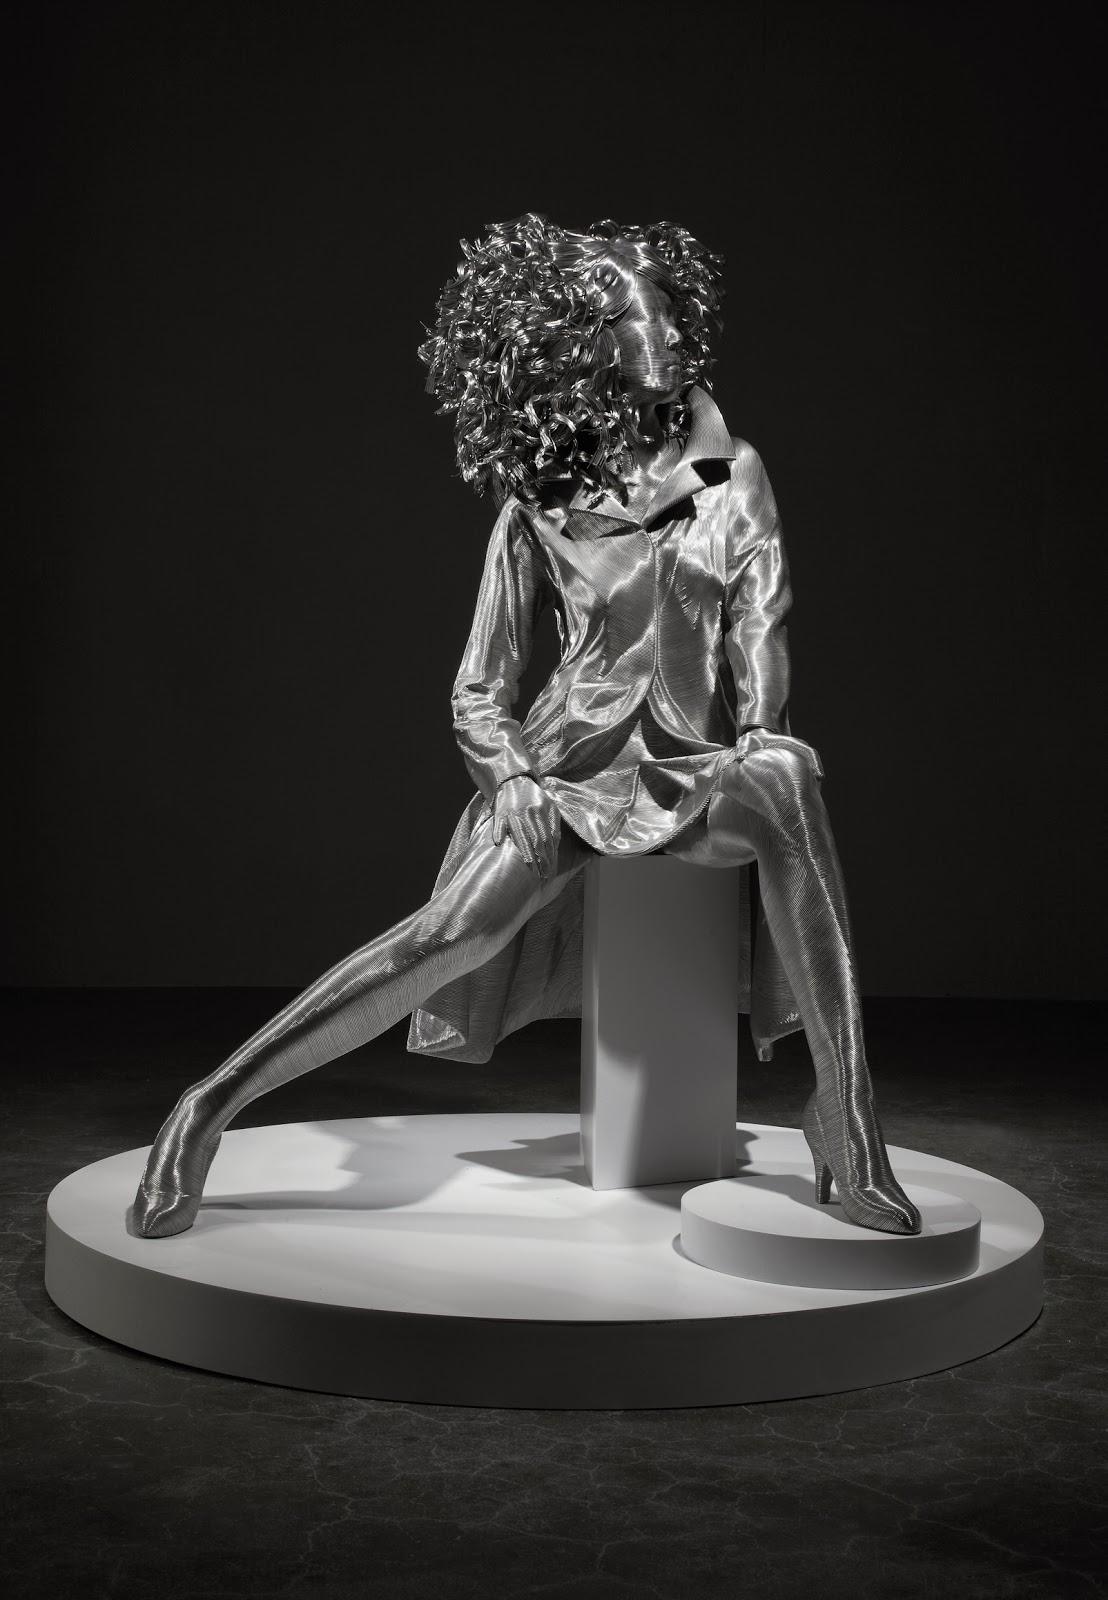 06-Park-Seung-Mo-South-Korean-Artist-&-Sculptor-Wire-Sculpture-www-designstack-co